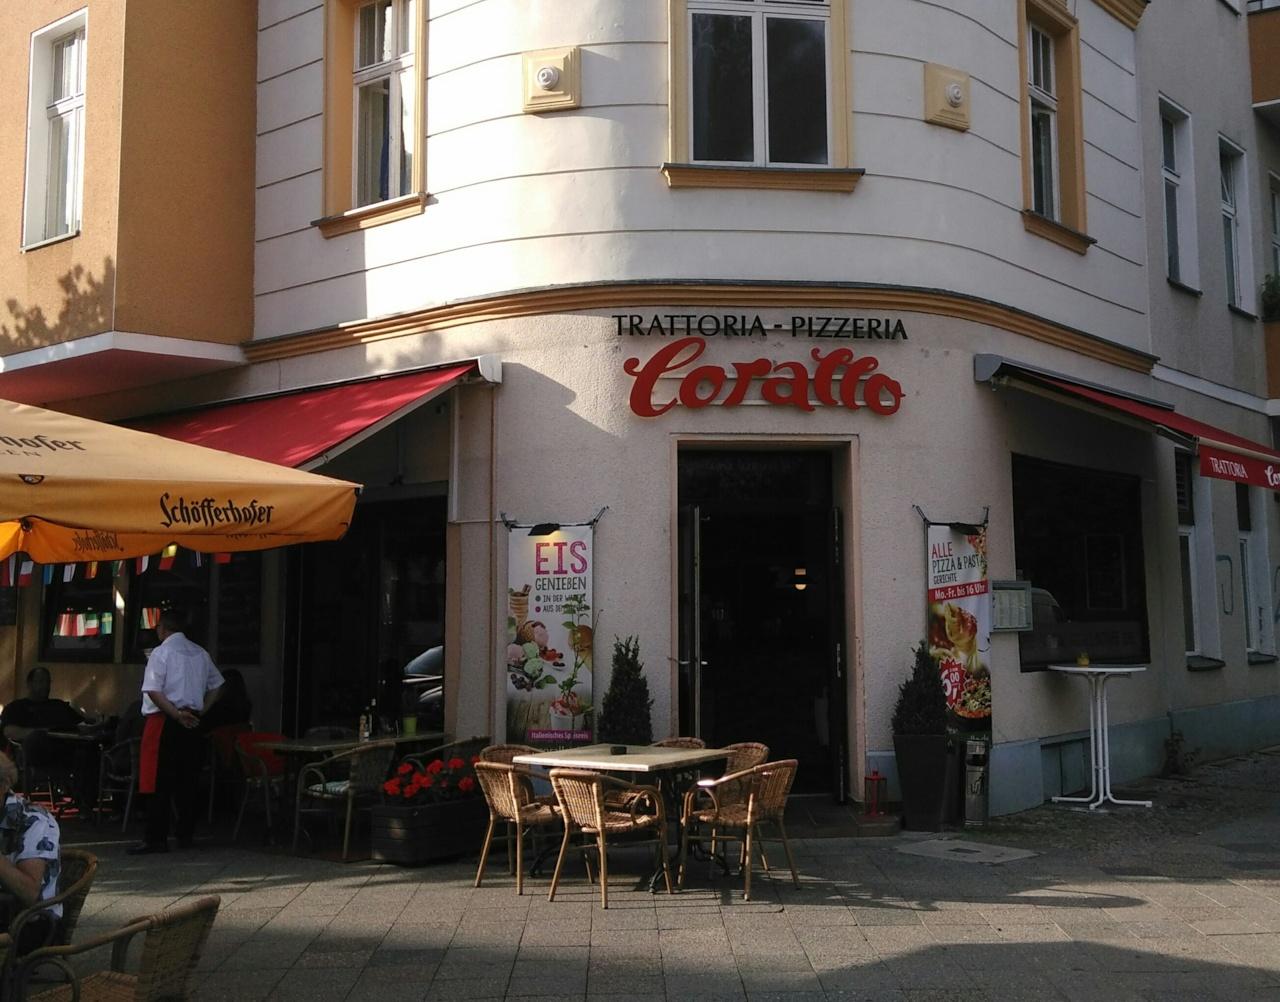 Corallo italienisches Restaurant